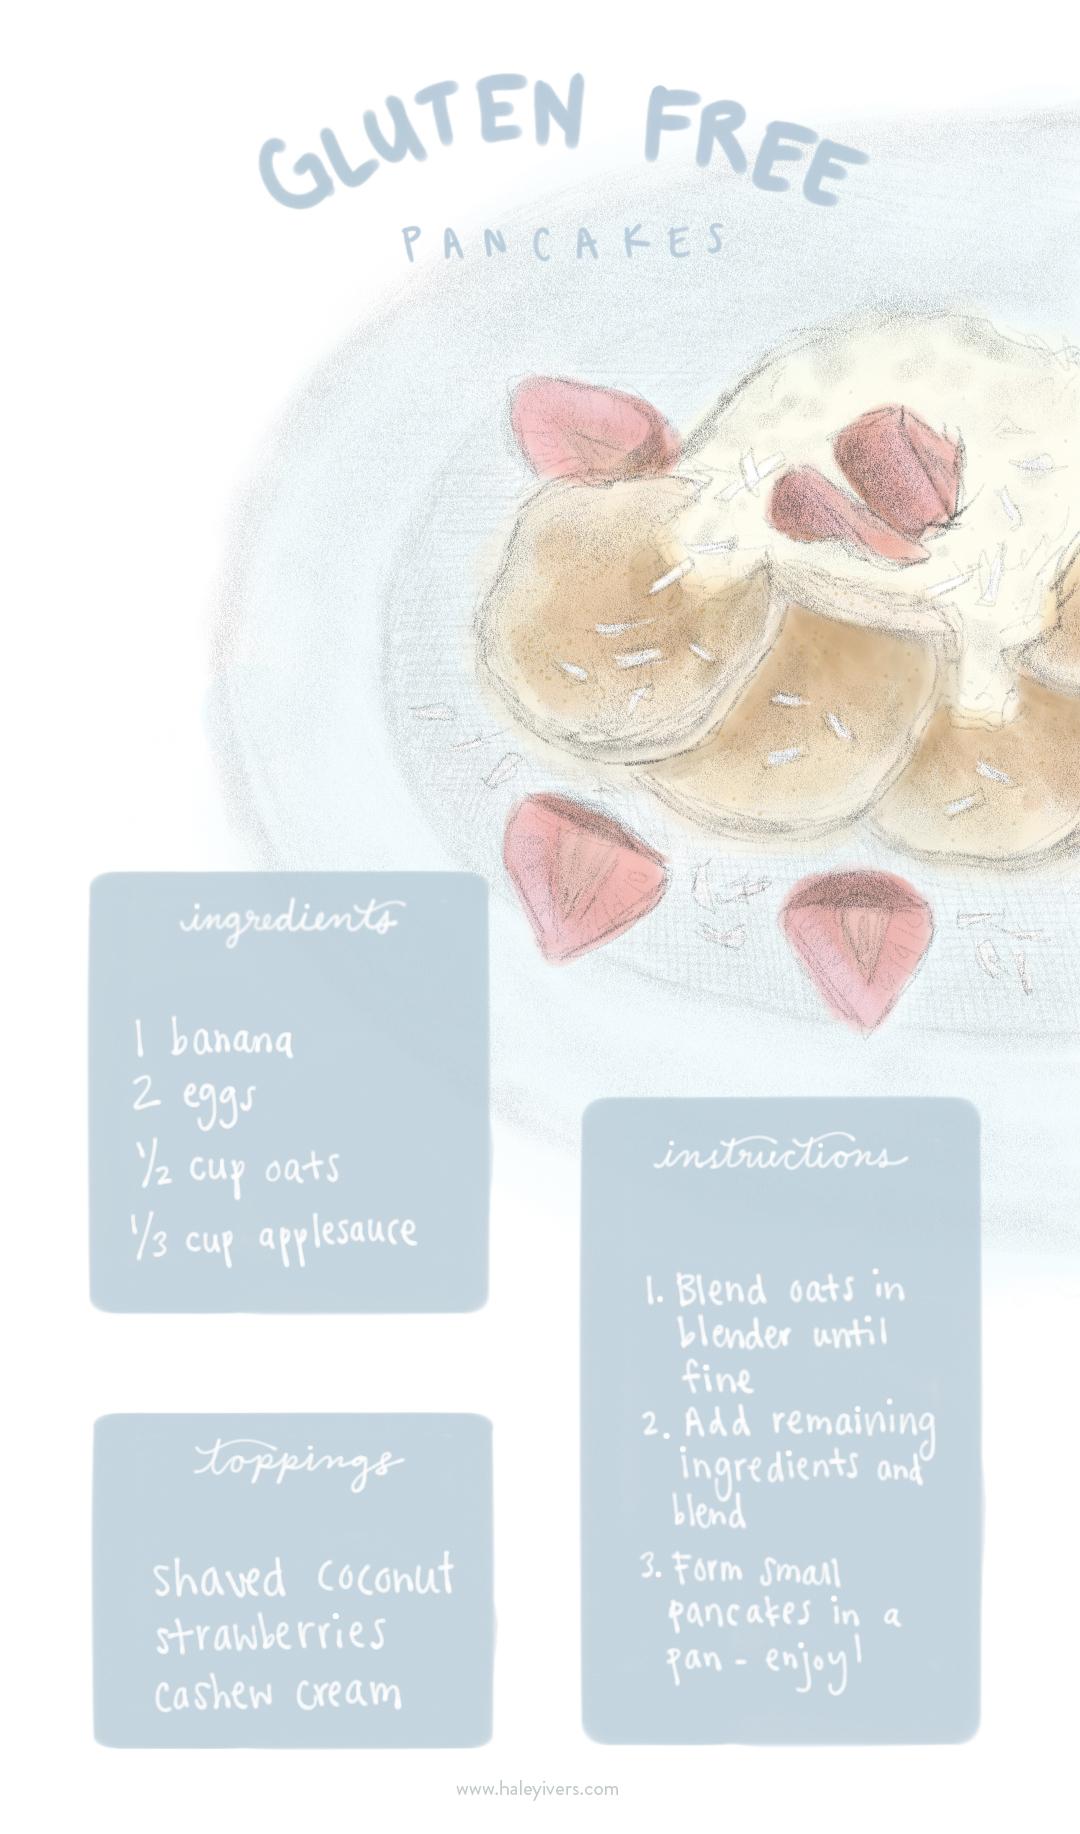 gluten free pancakes recipe and illustration